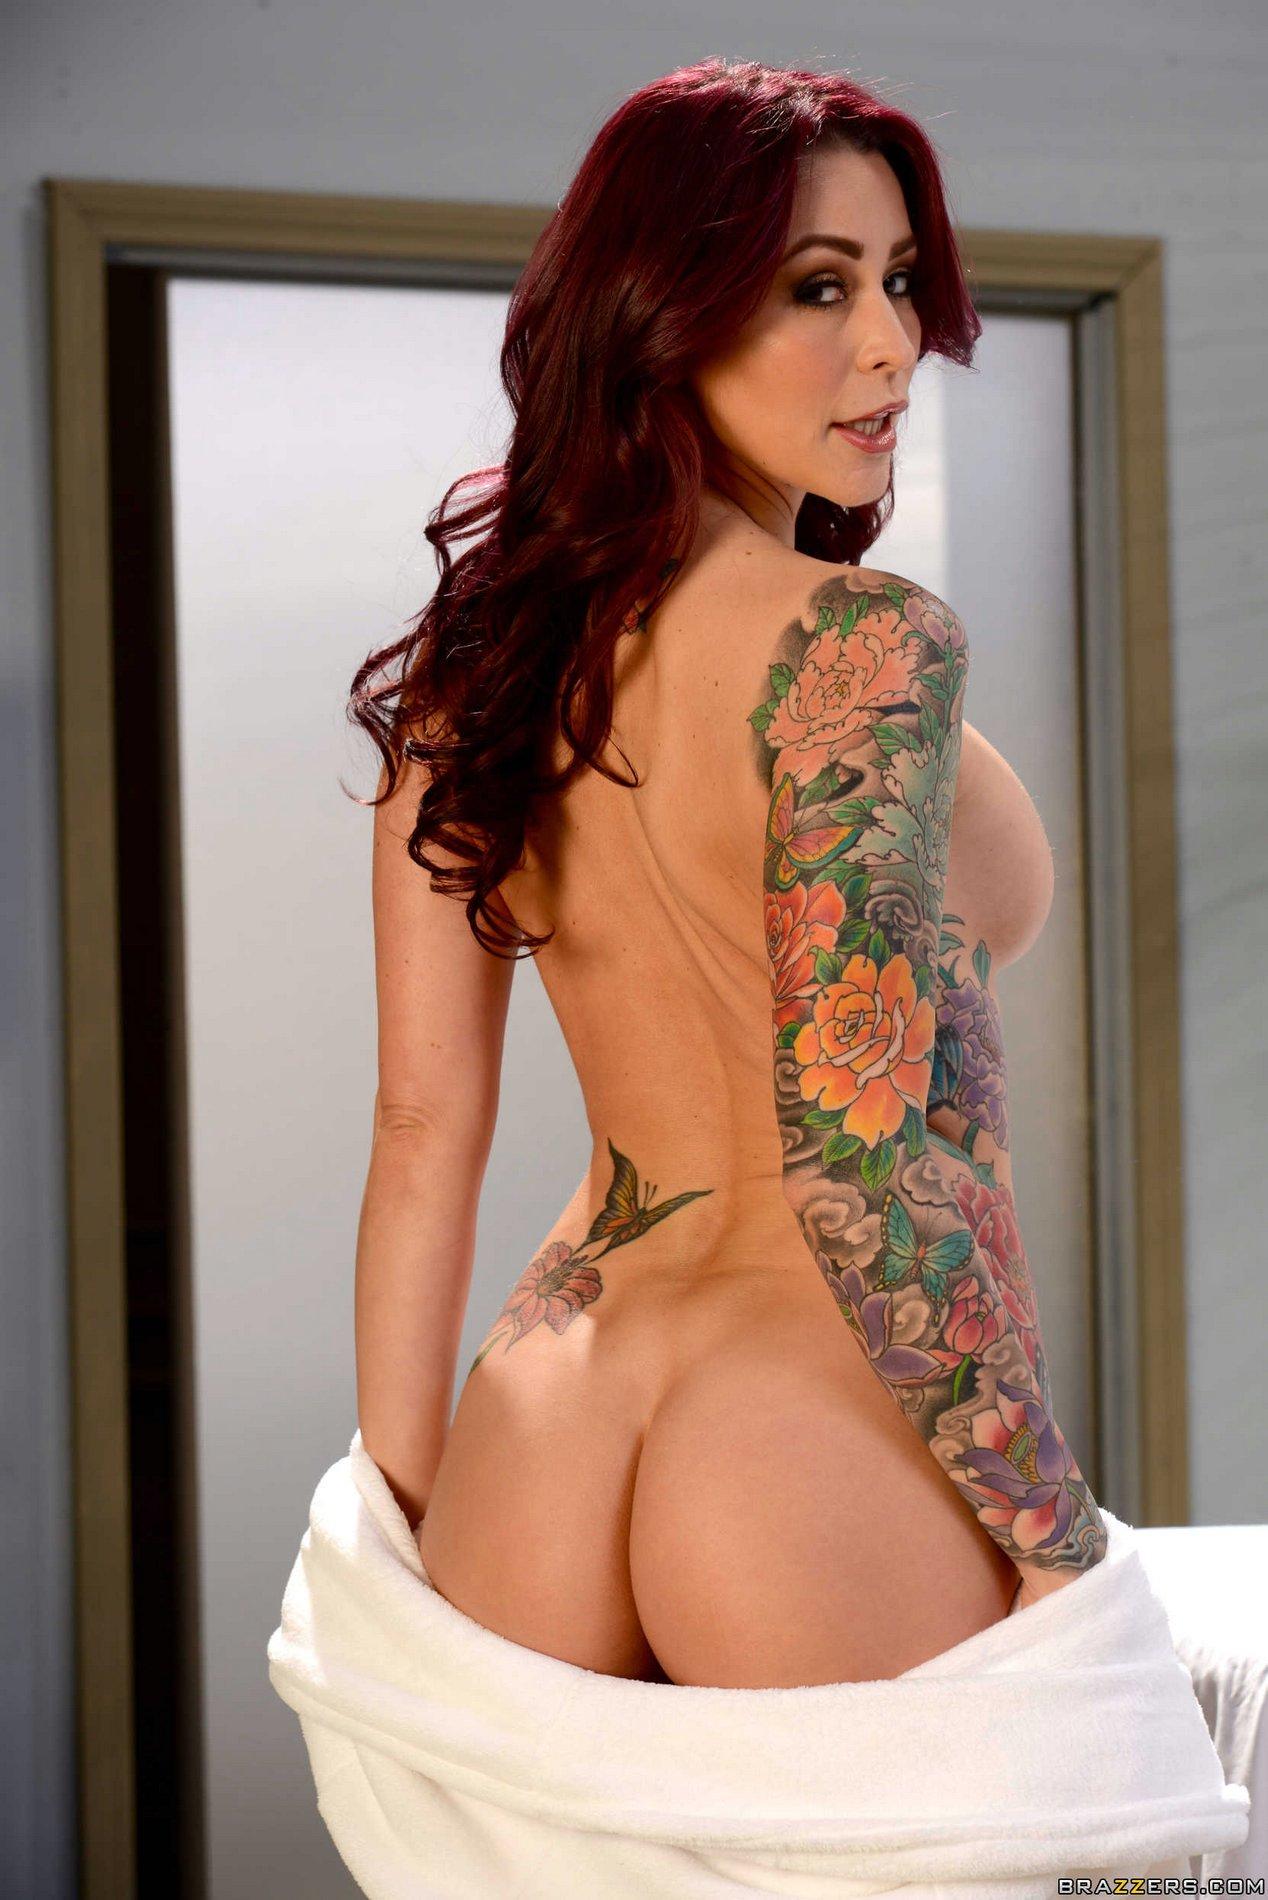 Tattooed redhead girlfriend monique alexander fucking 5